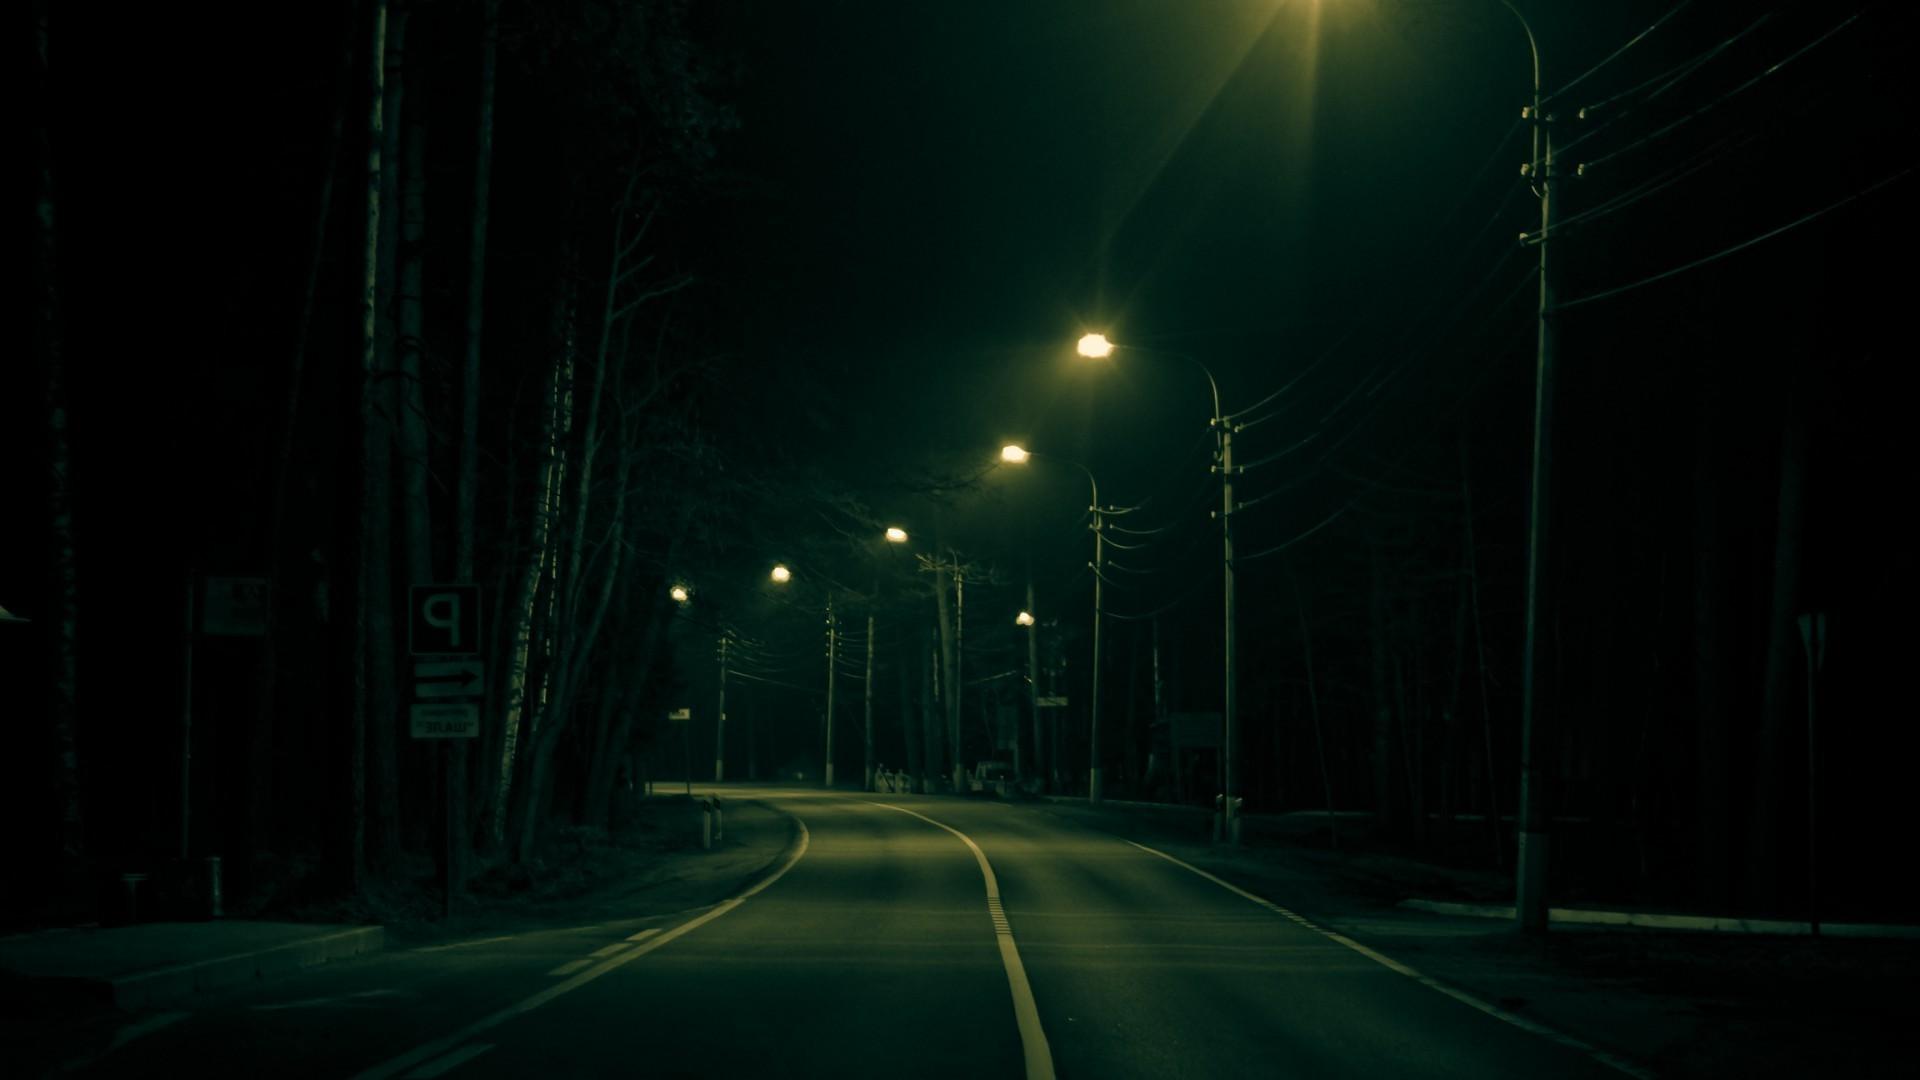 Sunlight Landscape Street Light Night Green Atmosphere Midnight Fog Lighting Darkness 1920x1080 Px Atmospheric Phenomenon